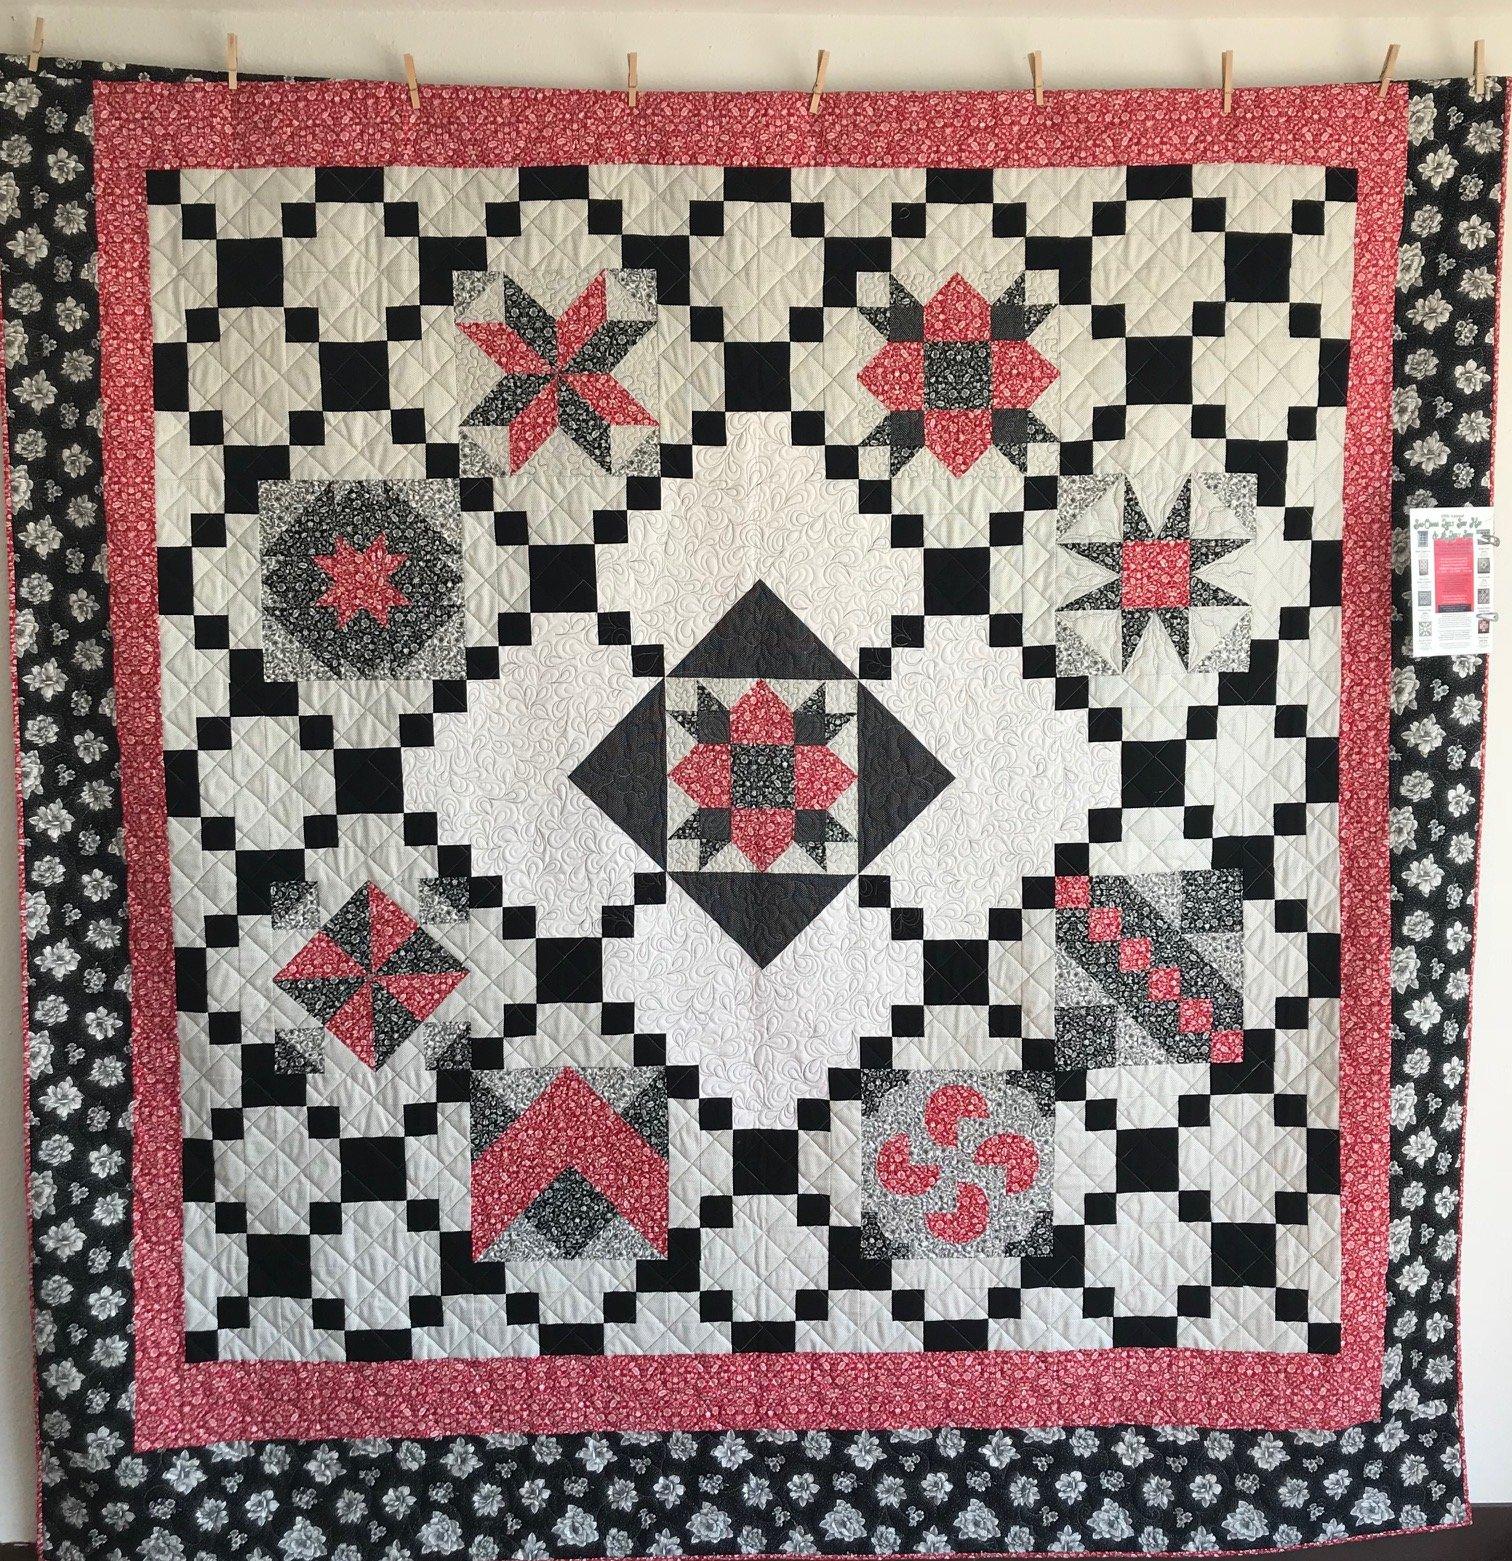 Red and Black Sampler 89x96